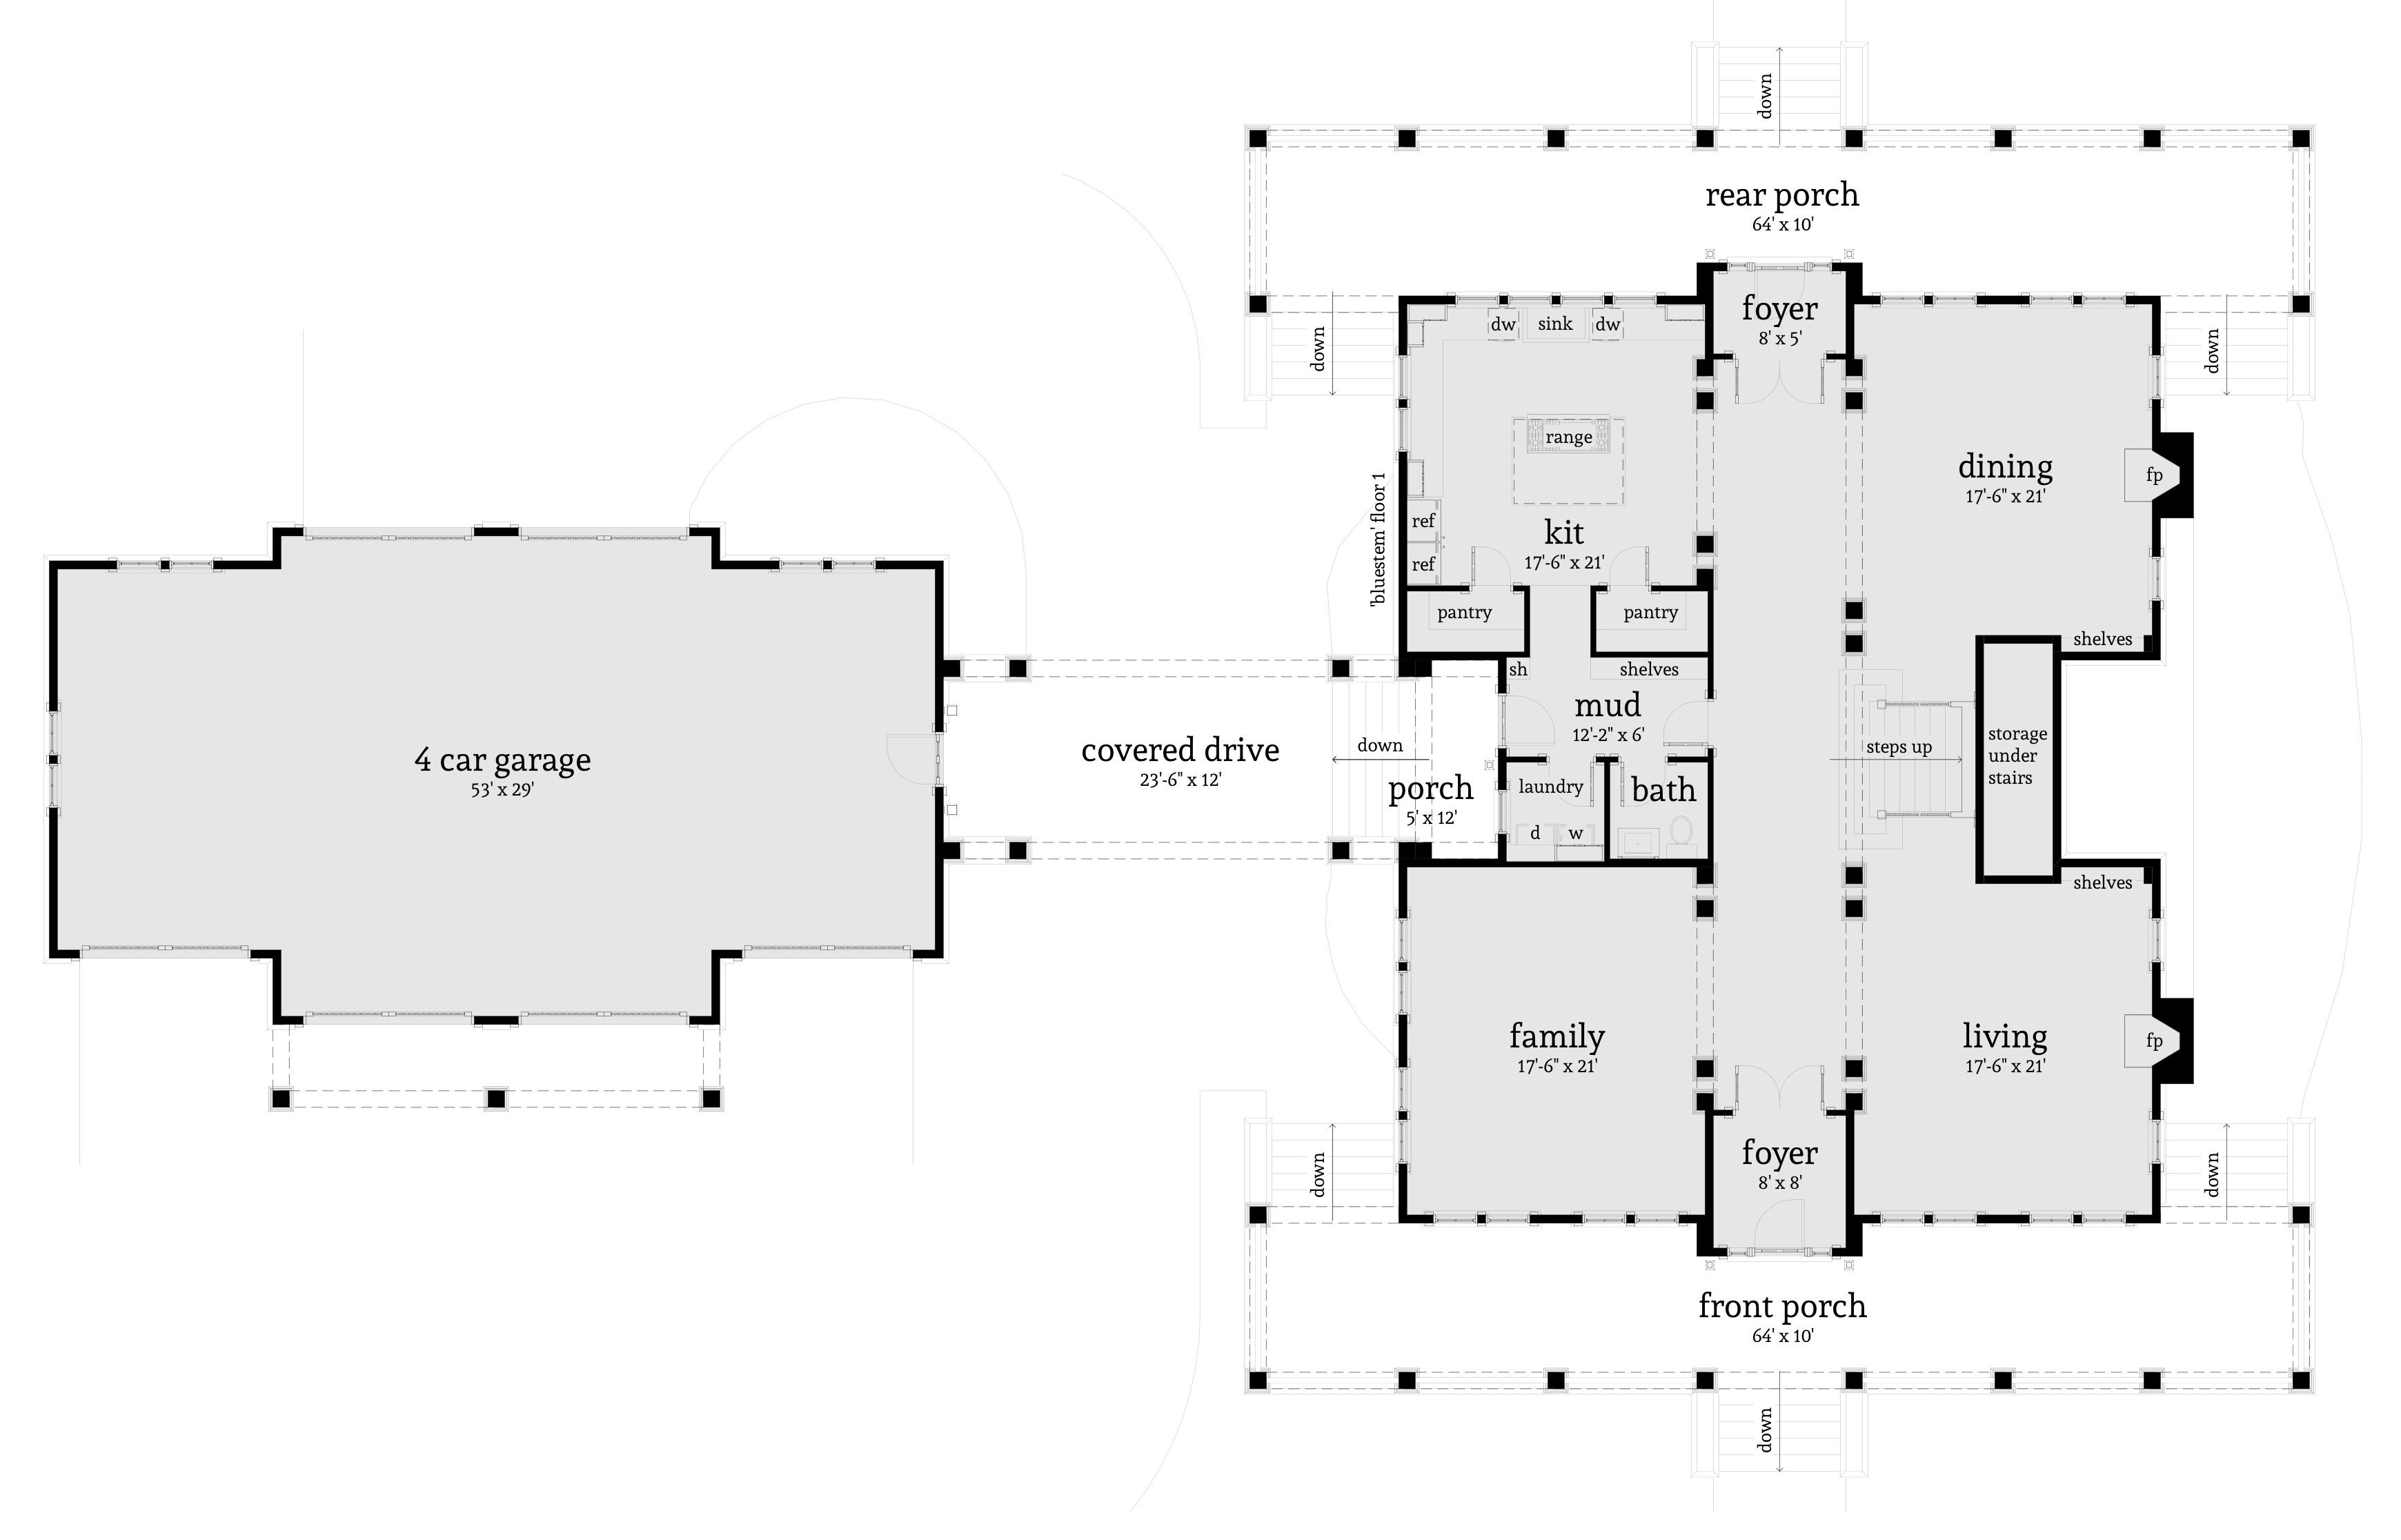 Bluestem Farmhouse Plan - 5 Beds, 5 Baths - Tyree House Plans